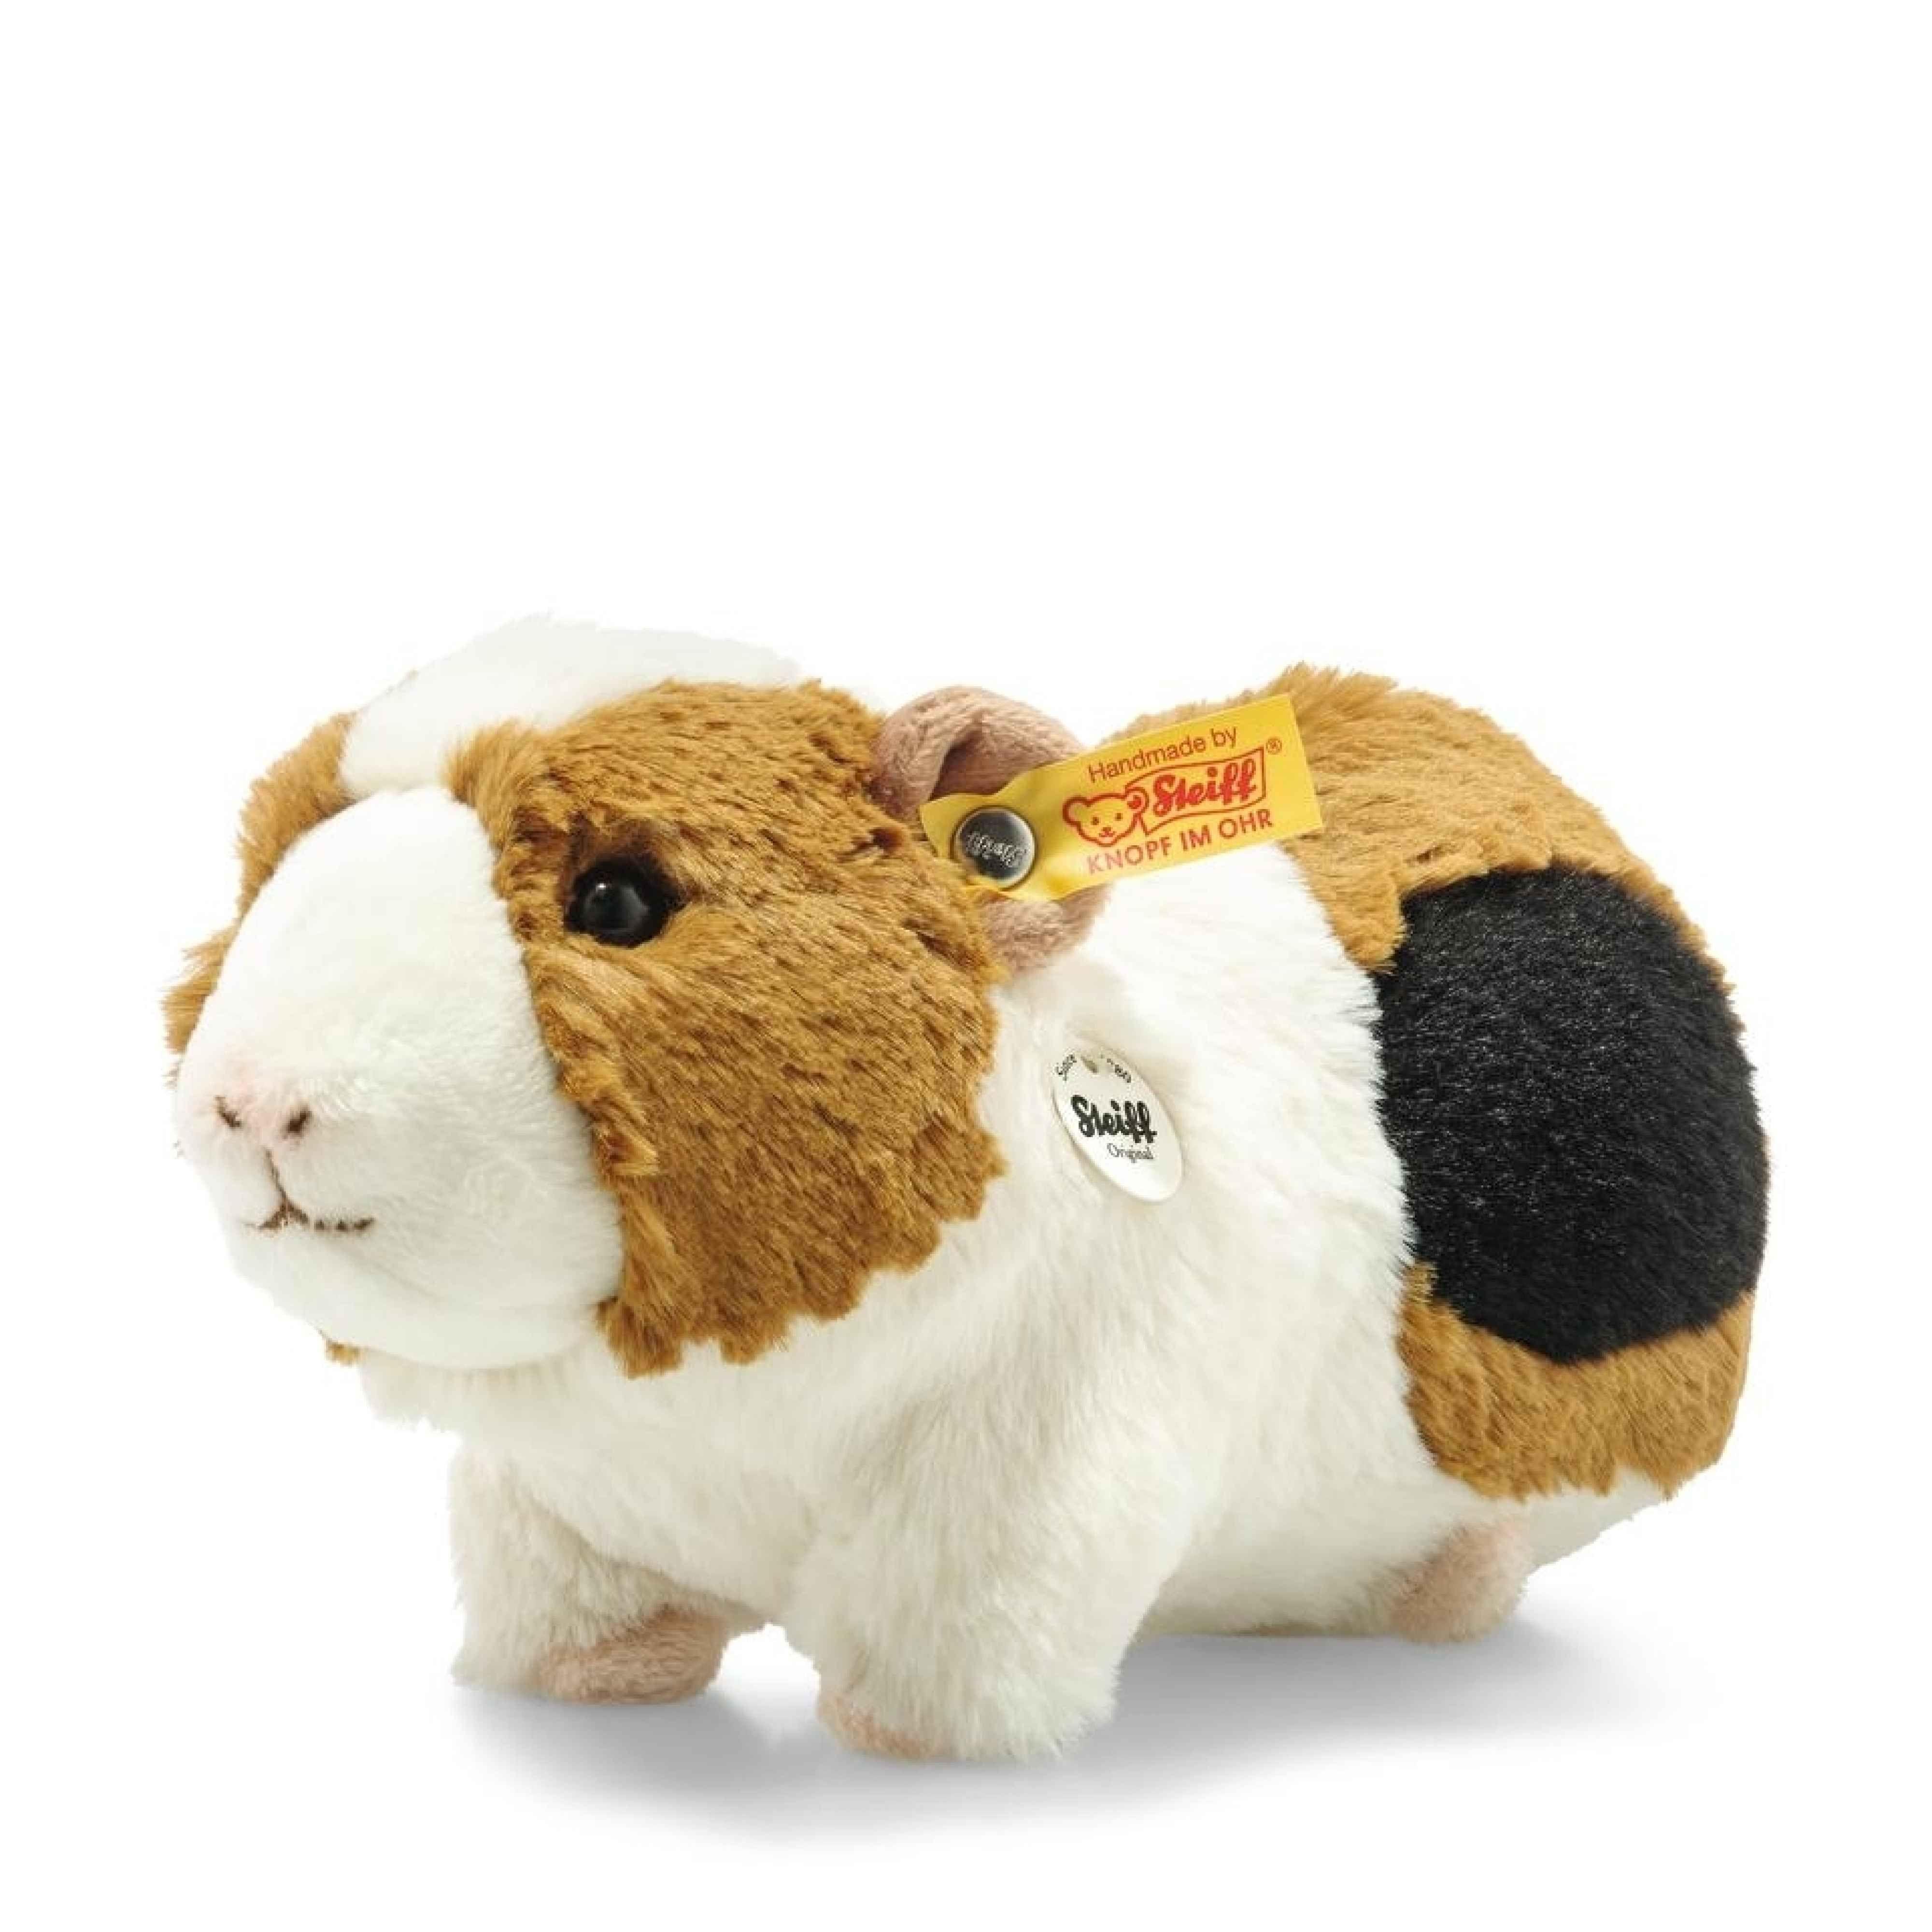 Steiff Dalle Guinea Pig Plush 22cm 073830